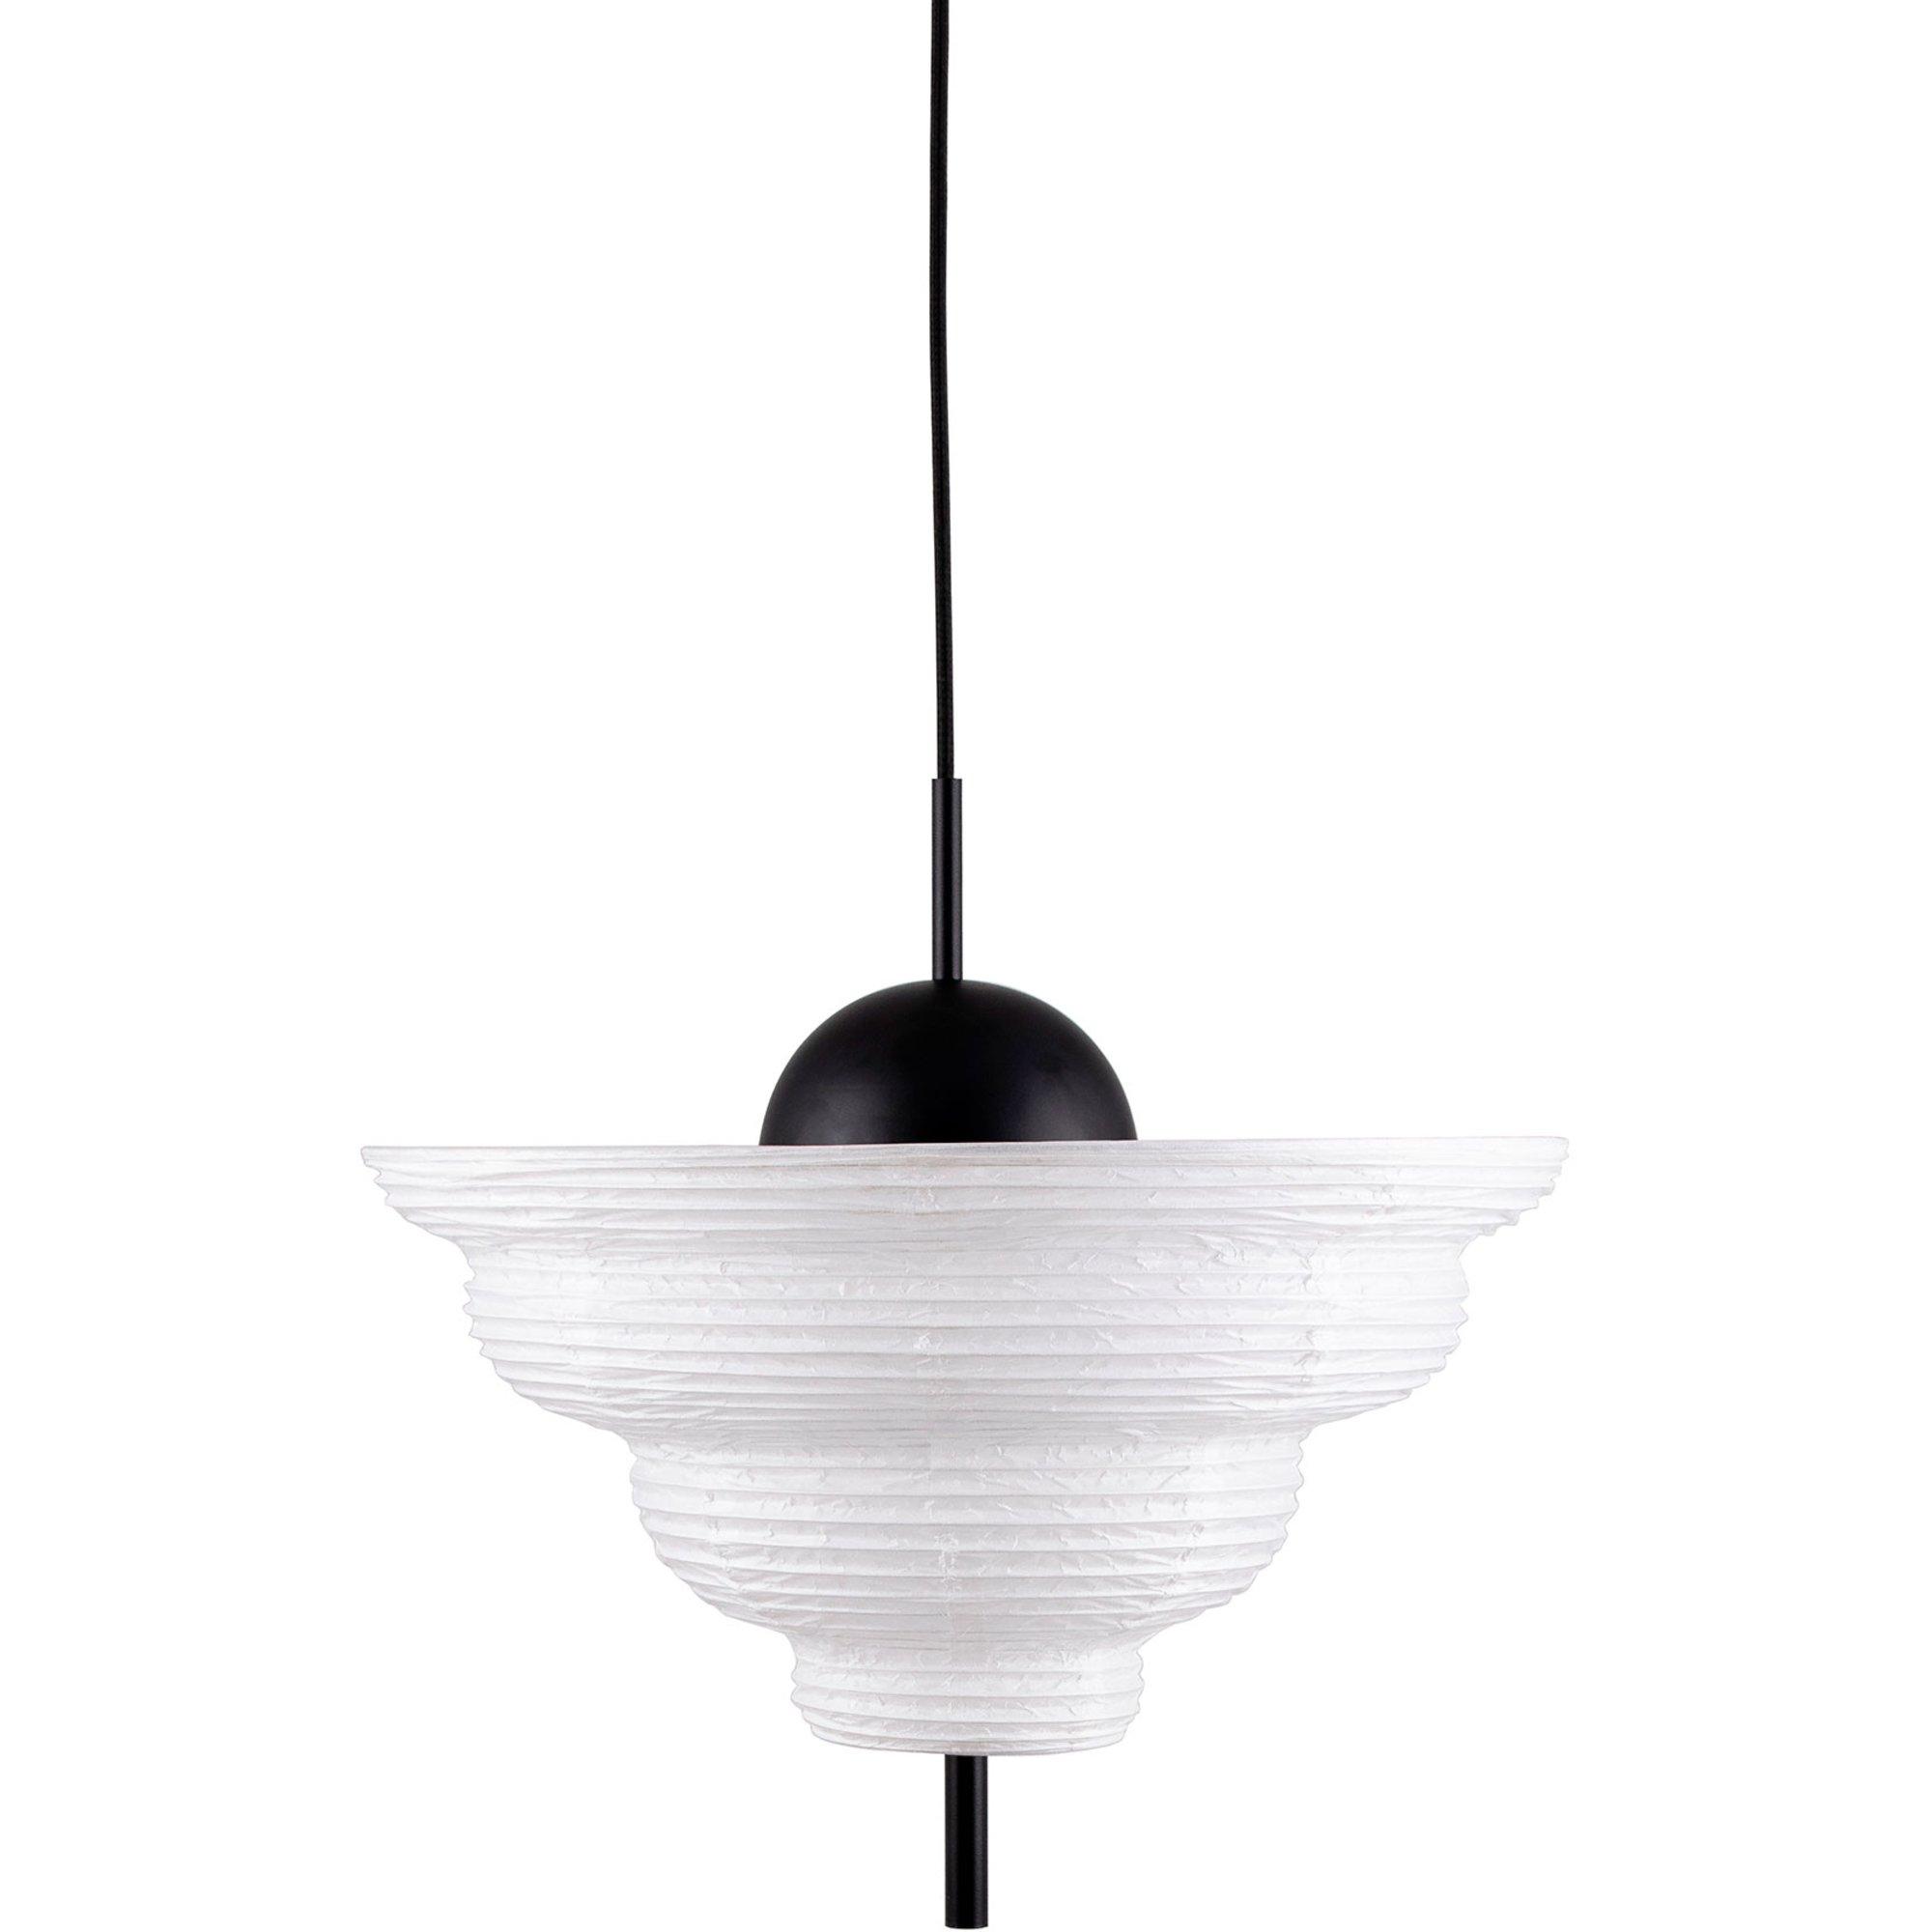 Globen Lighting Kyoto Pendel 45 cm vit